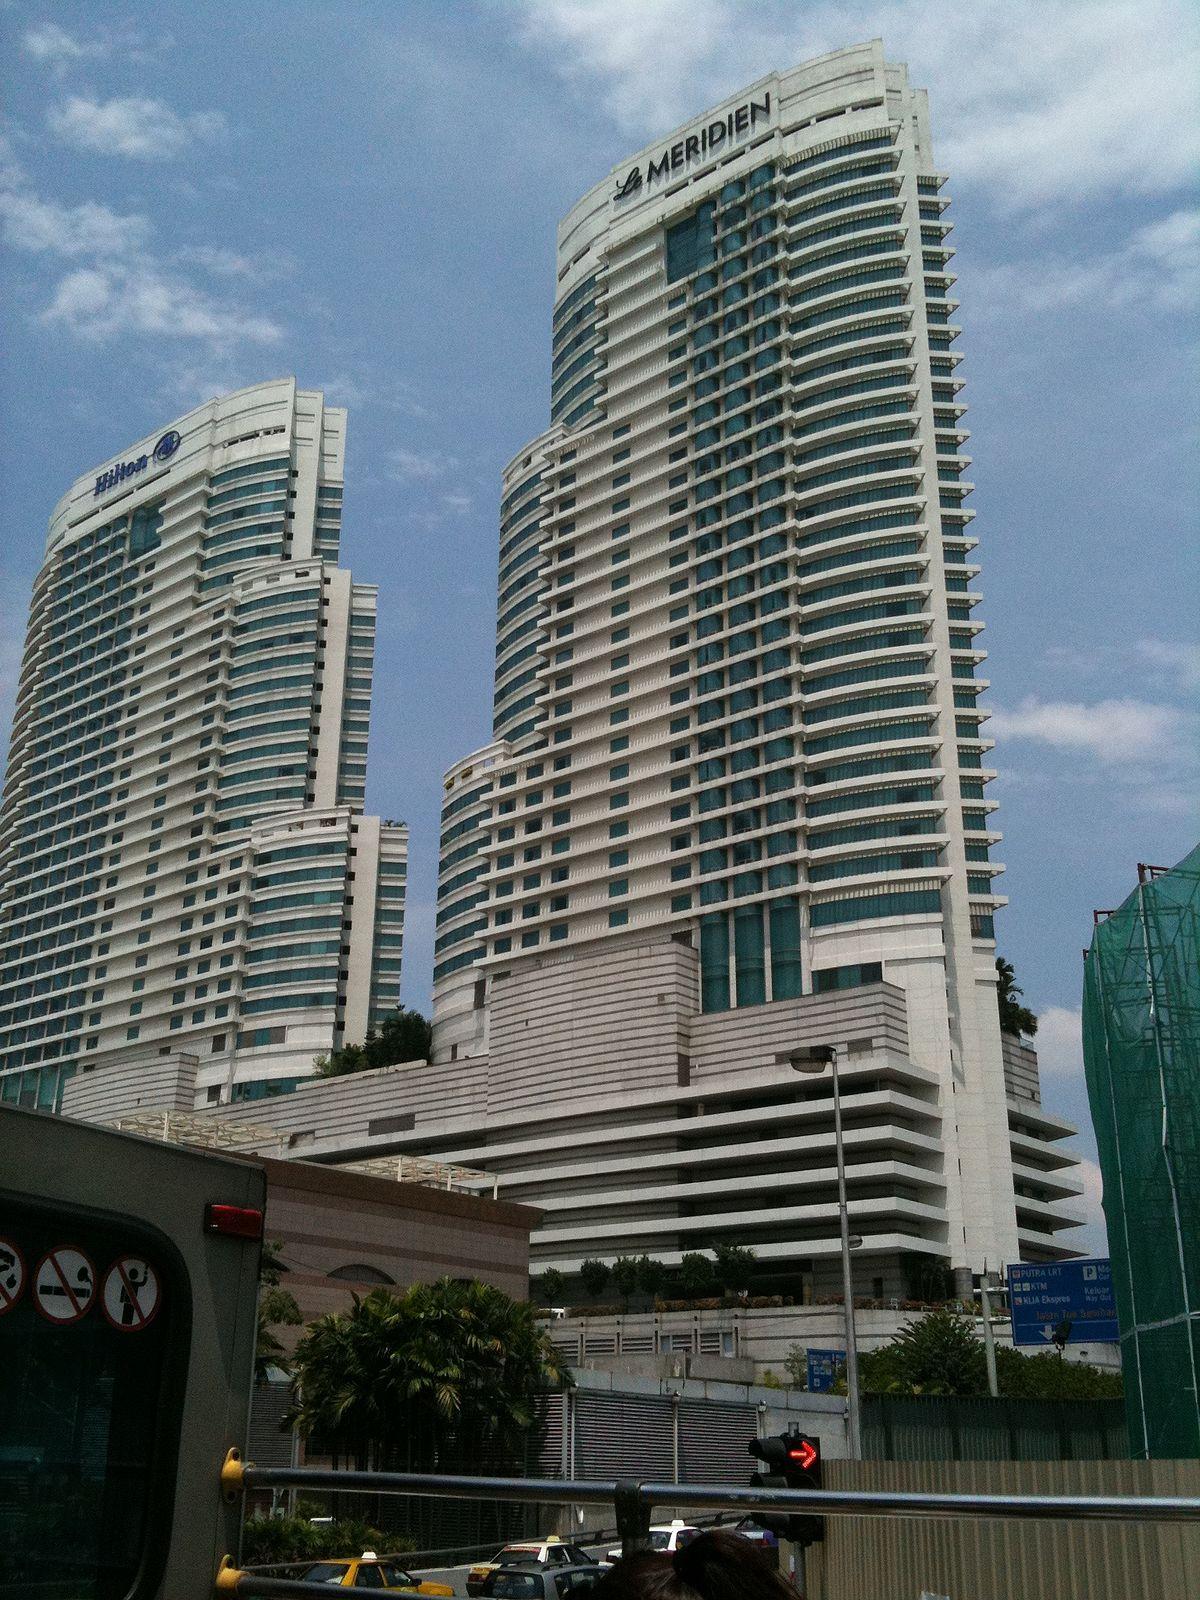 Hilton Hotel Information